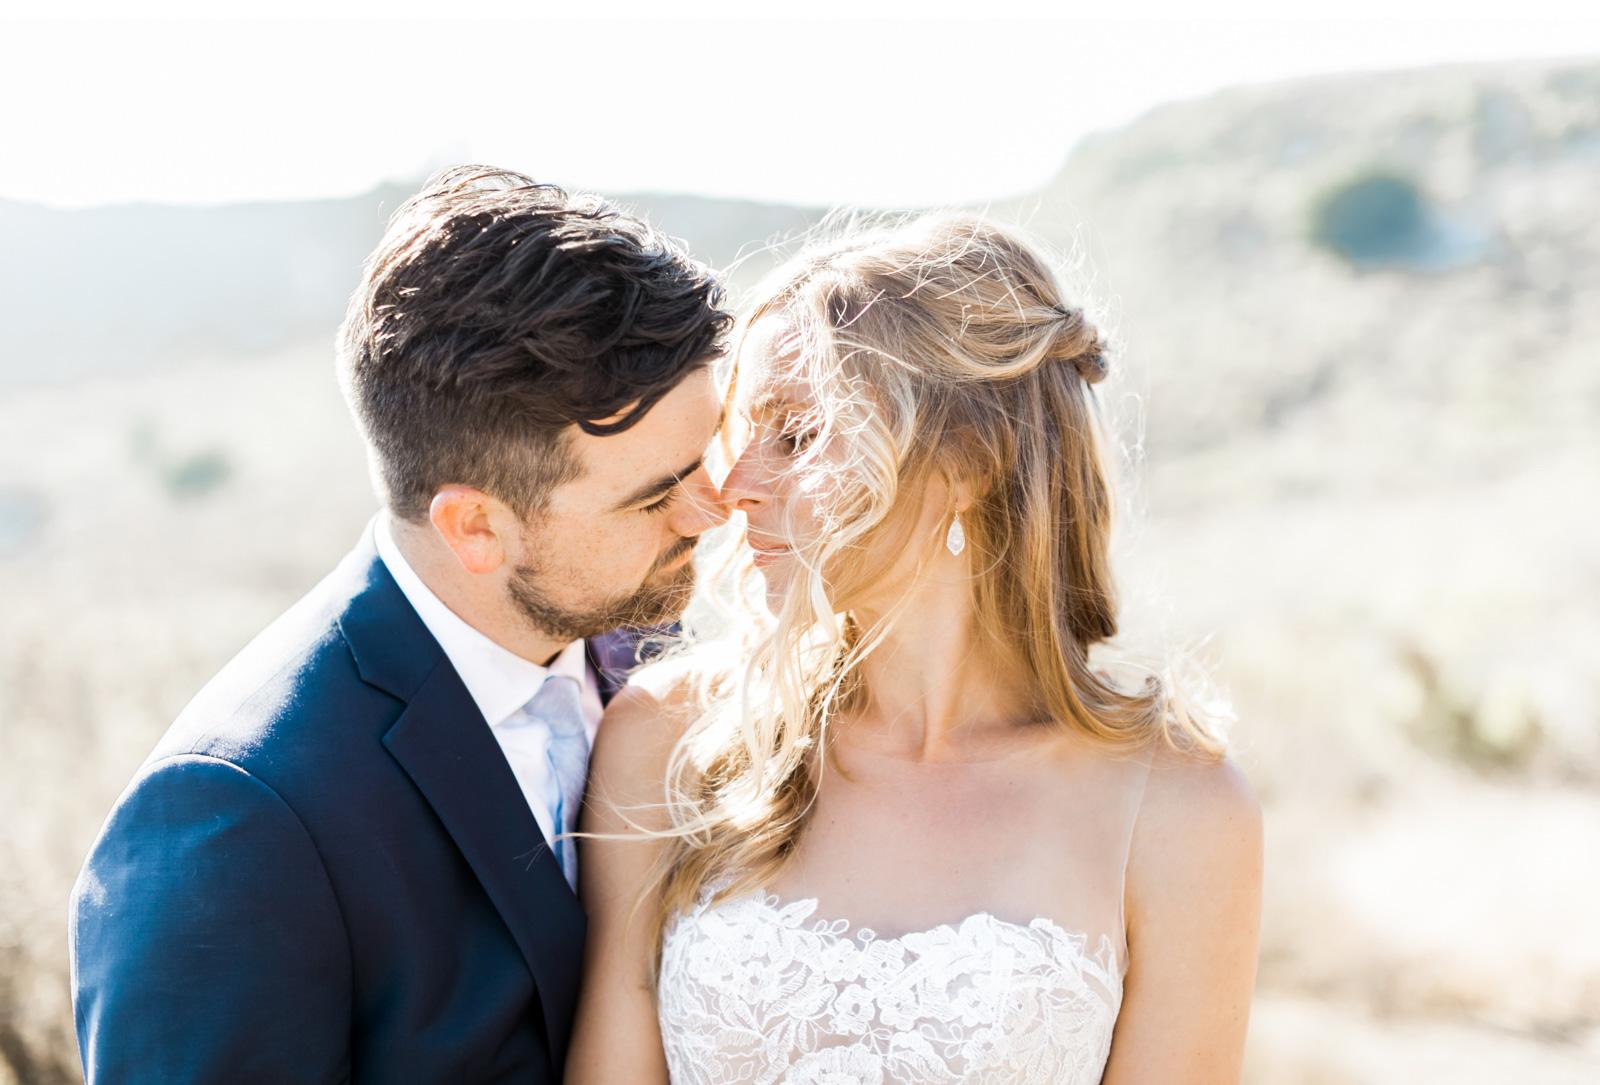 Style-Me-Pretty-San-Luis-Obispo-Wedding-Natalie-Schutt-Photography_05.jpg